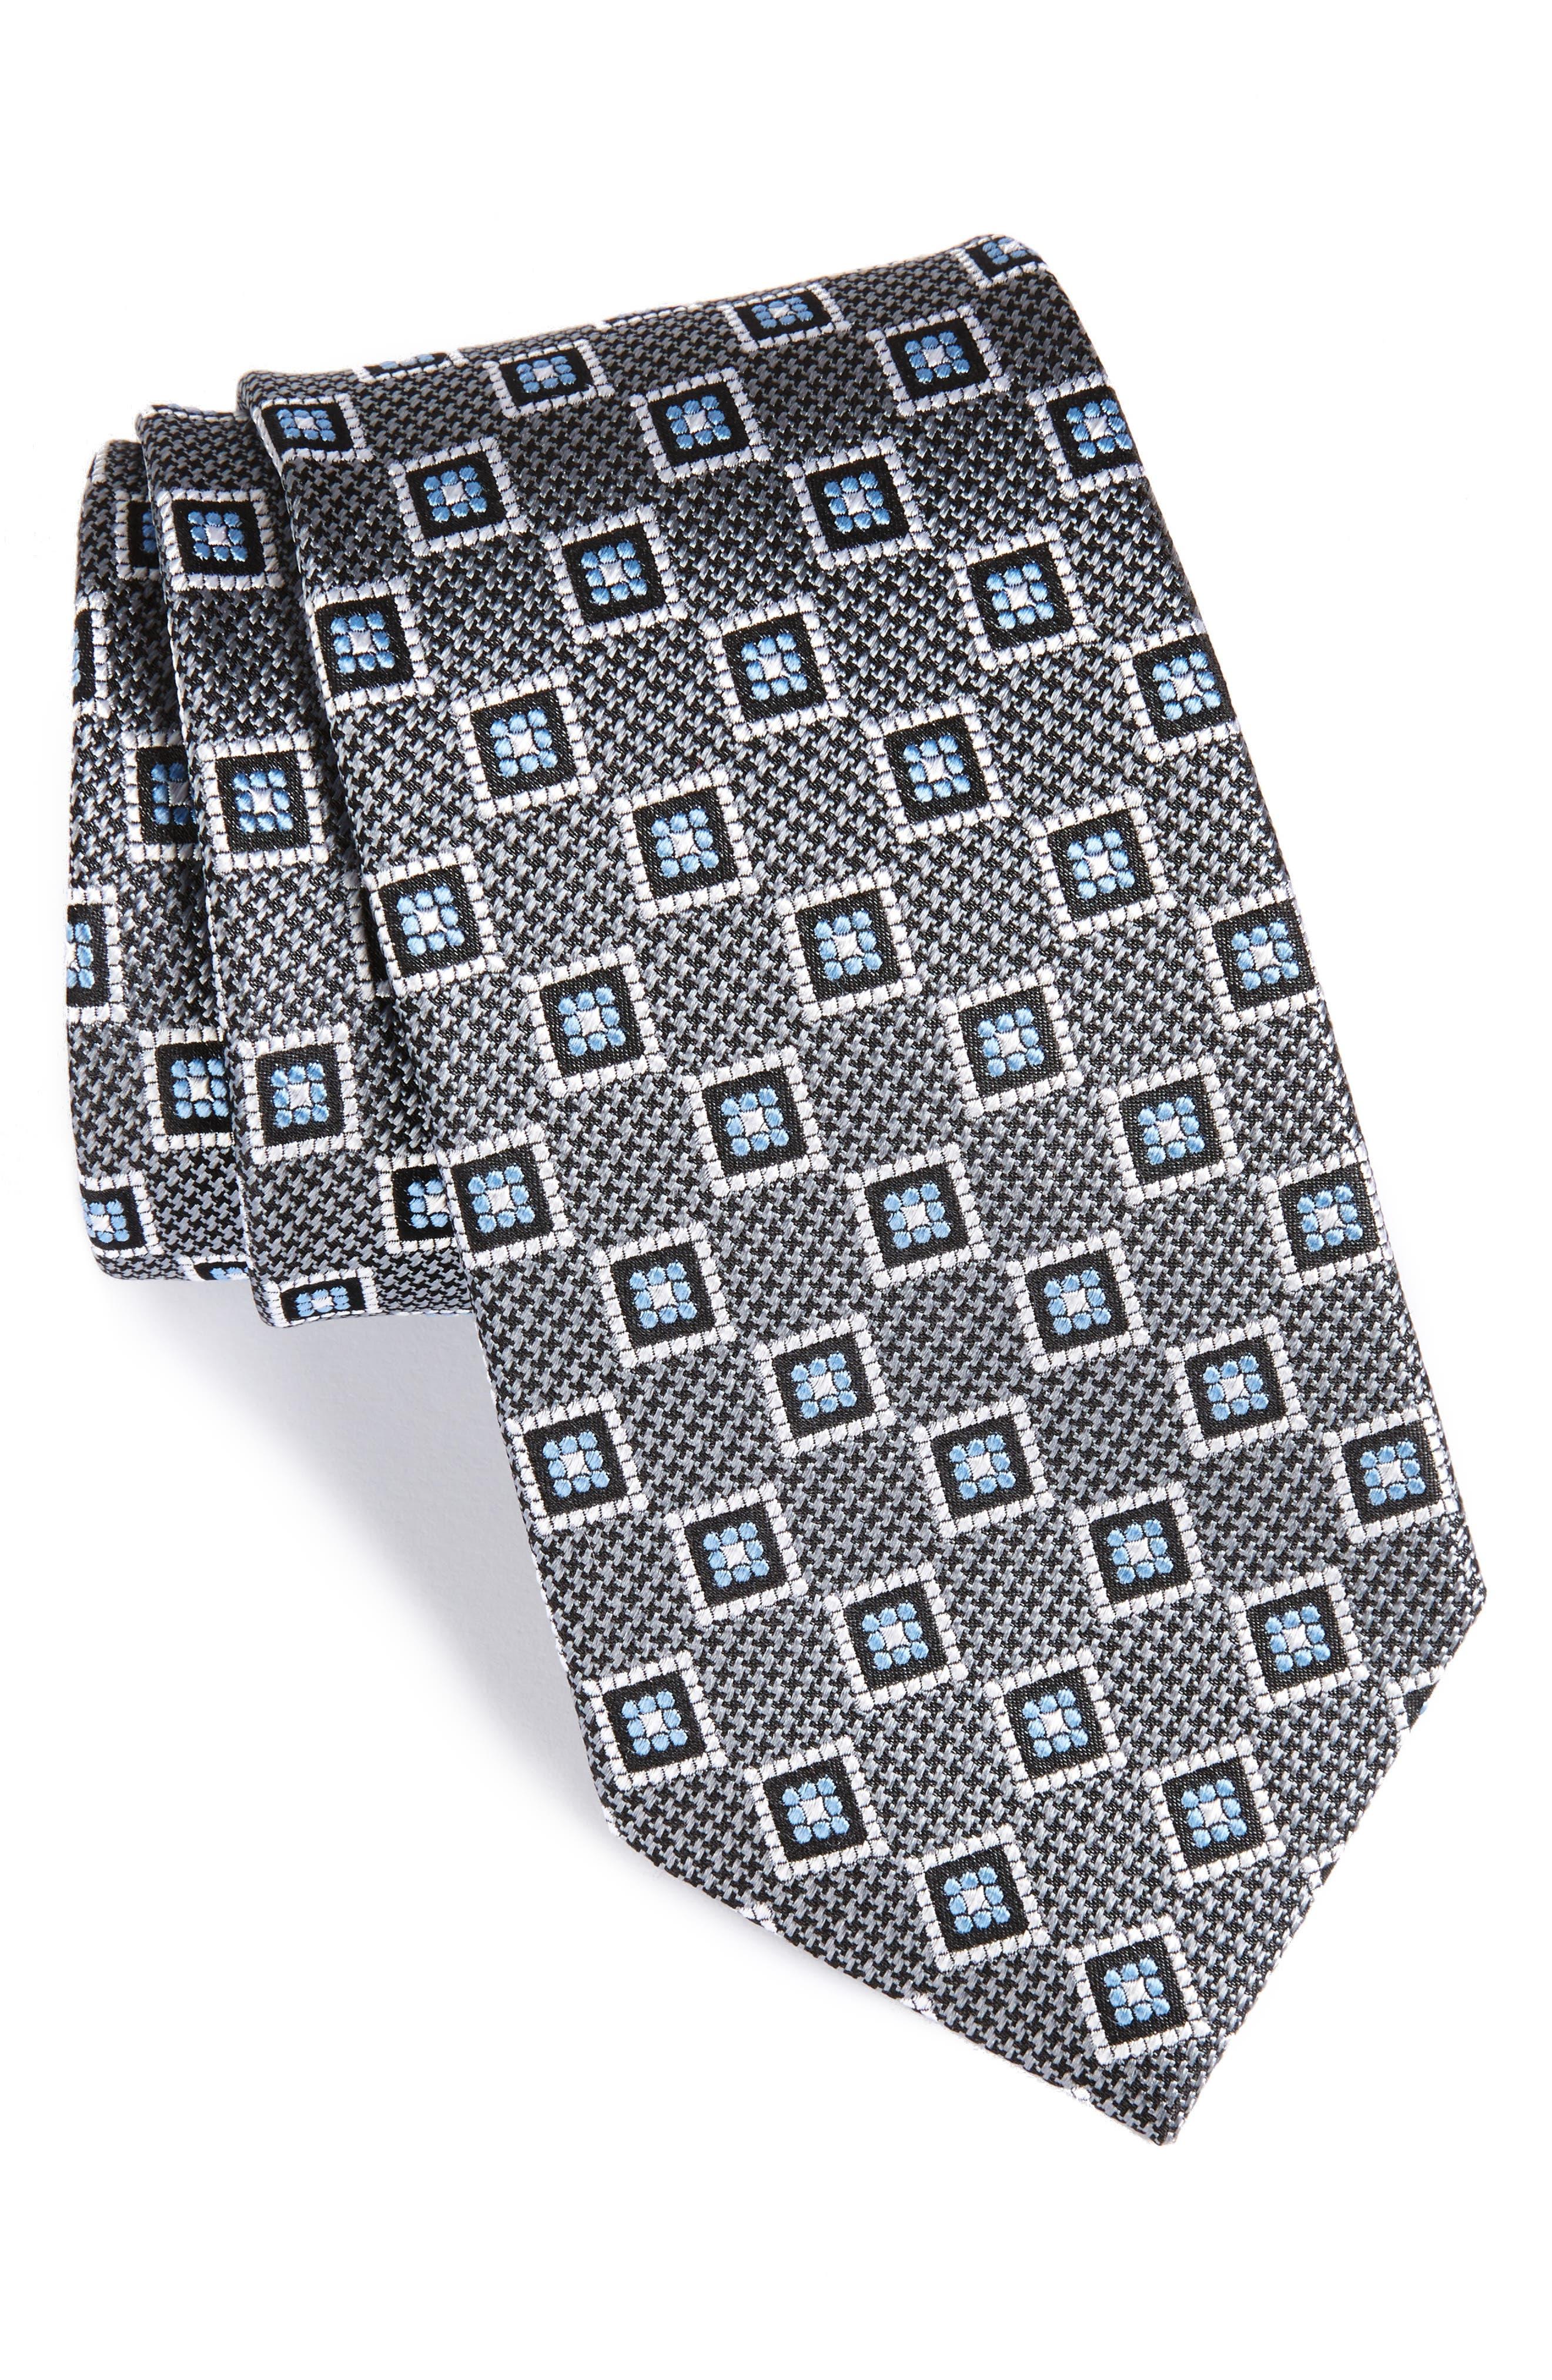 Main Image - Nordstrom Men's Shop Neat Geometric Medallion Silk Tie